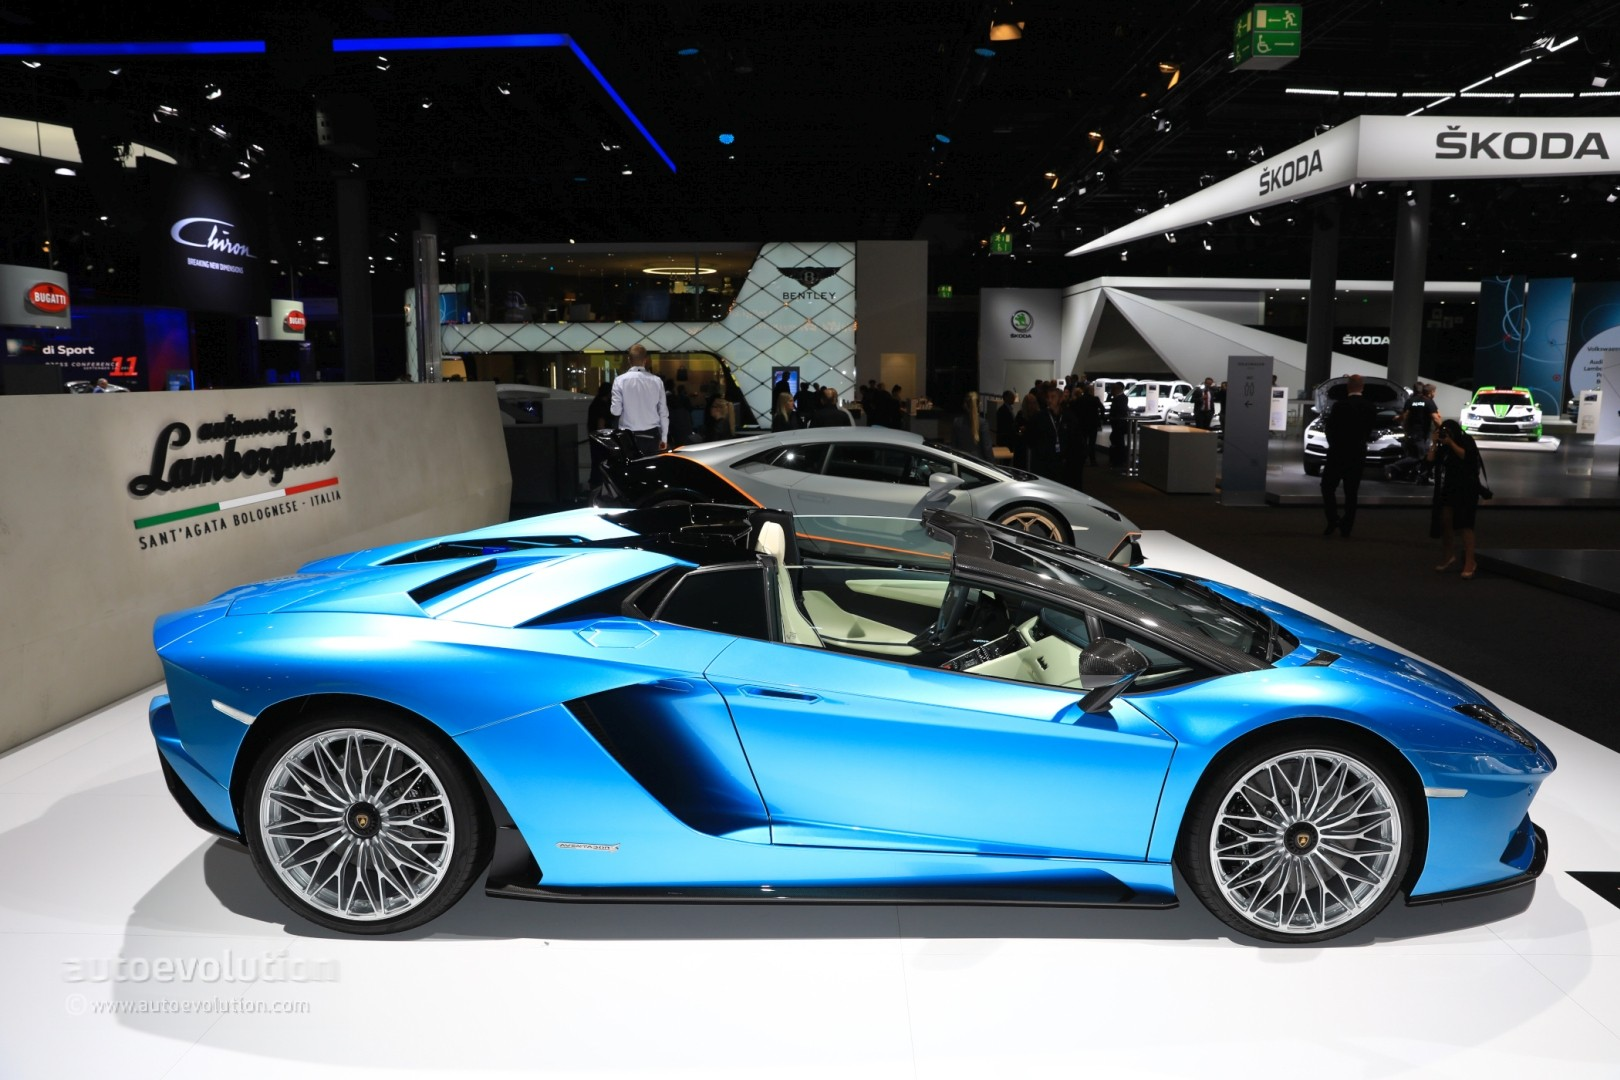 Lamborghini Price 2017 >> 2018 Lamborghini Aventador S Roadster Rendered as The Supercar We Need Right Now - autoevolution